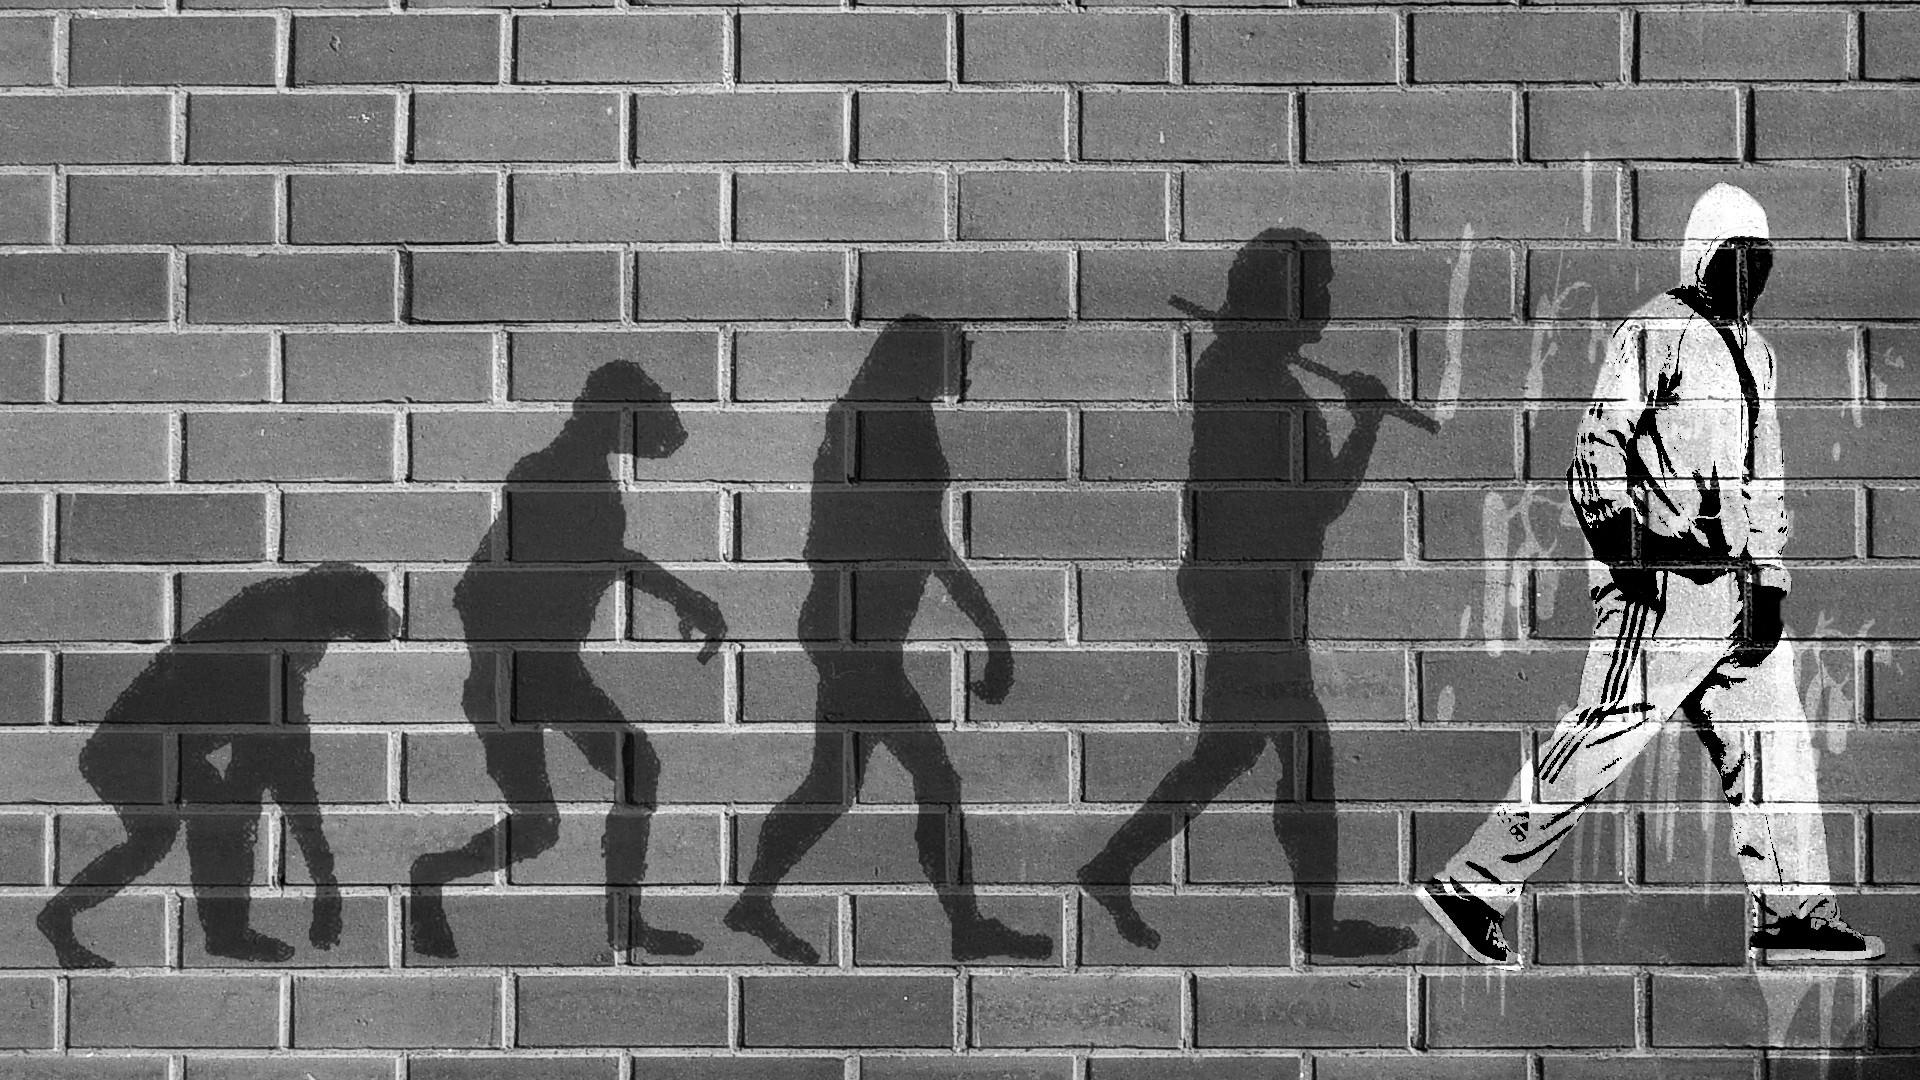 Image manipulation – Experimenting (Banksy) | Patrick .